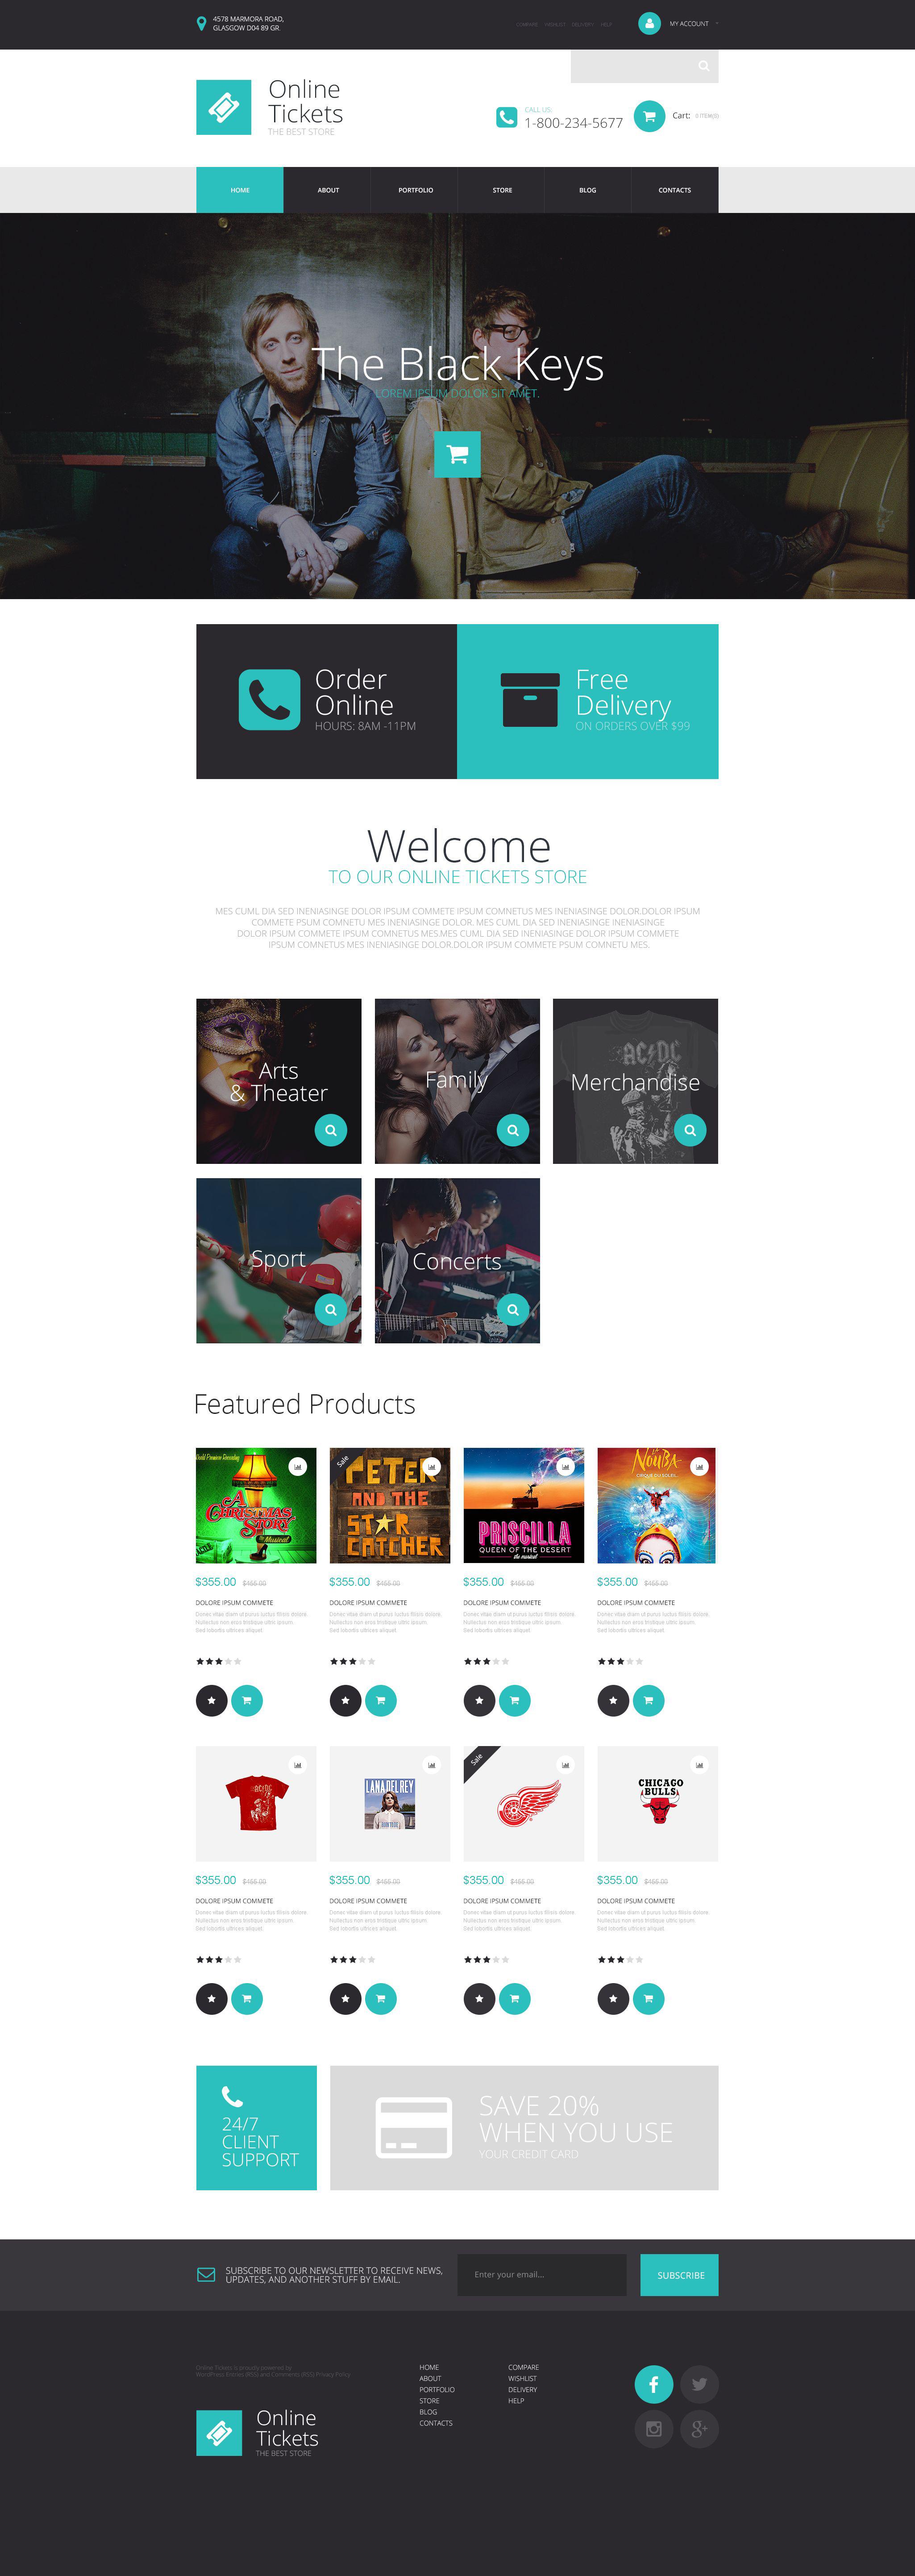 """Online Tickets Store"" - адаптивний WooCommerce шаблон №53950"